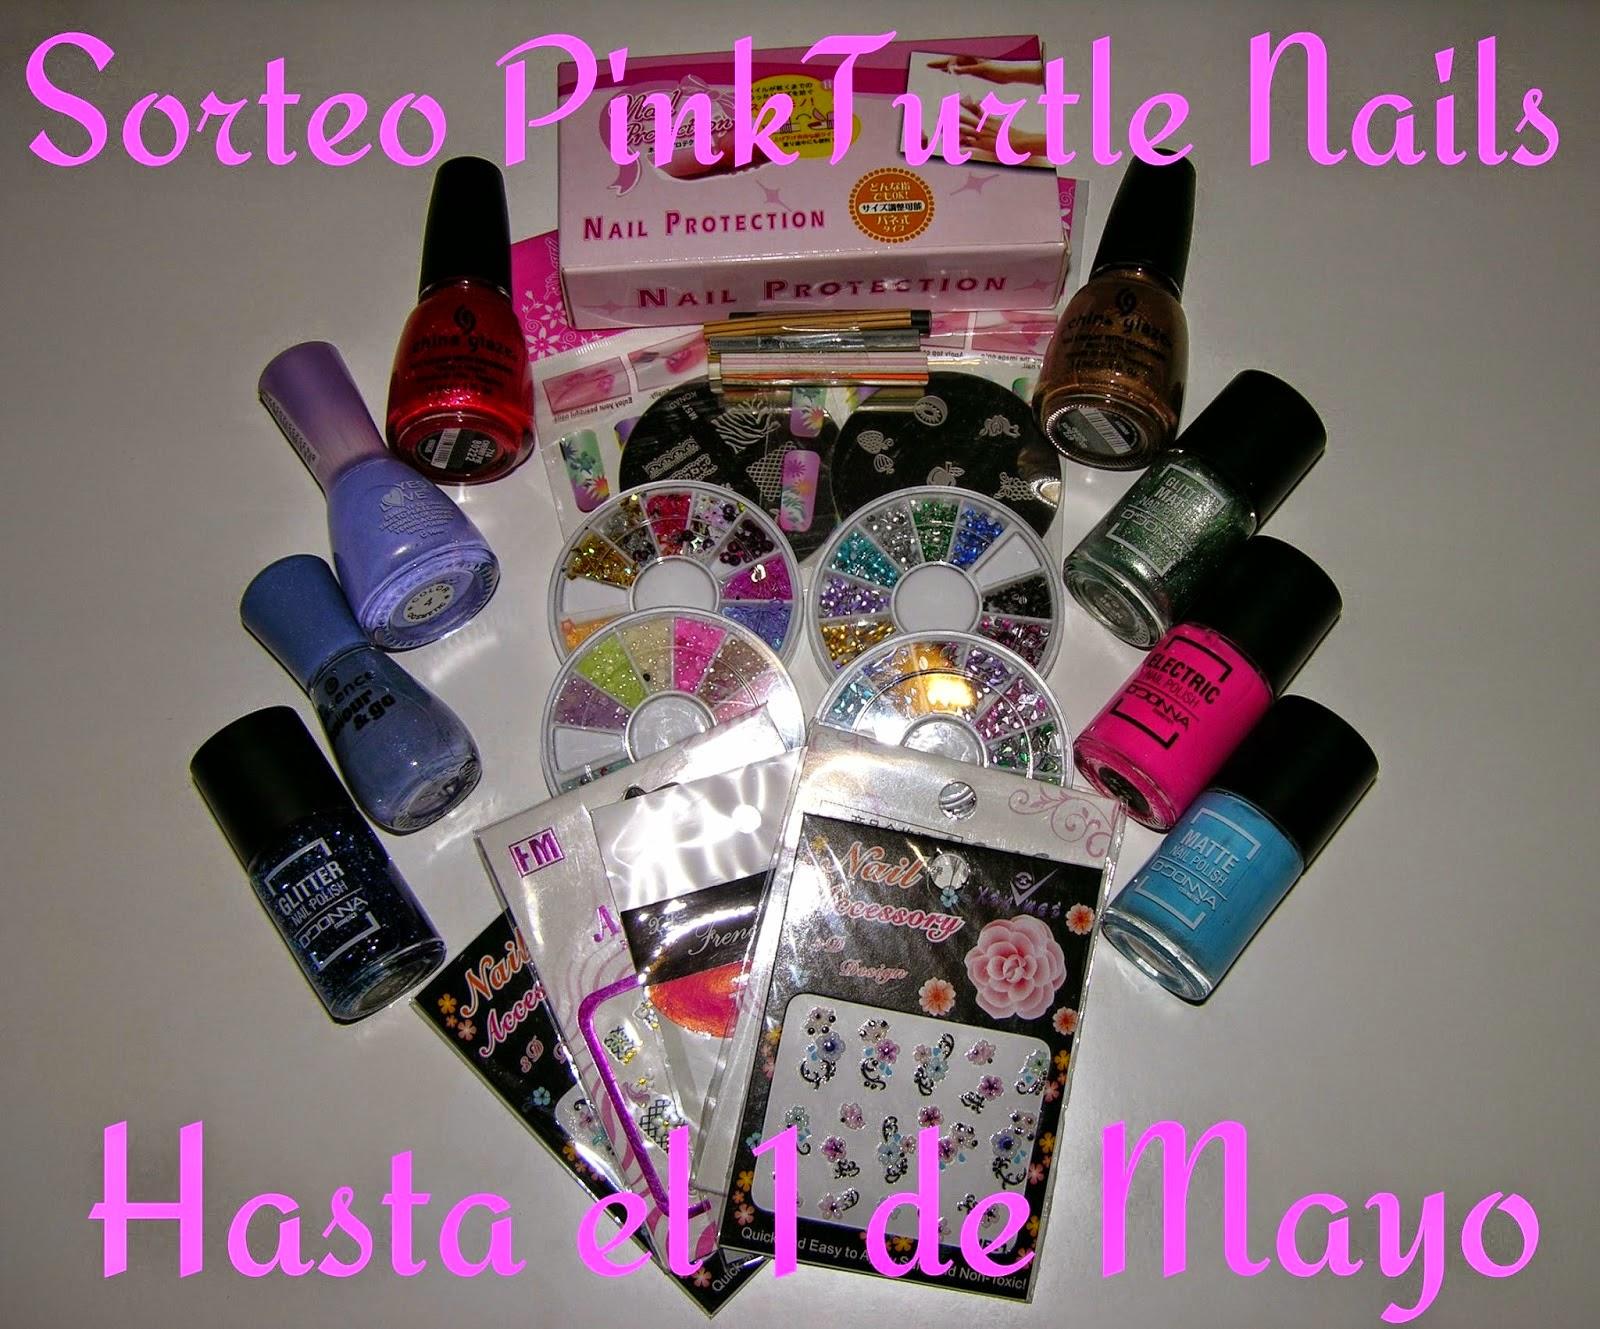 sorteo pink turtle nails